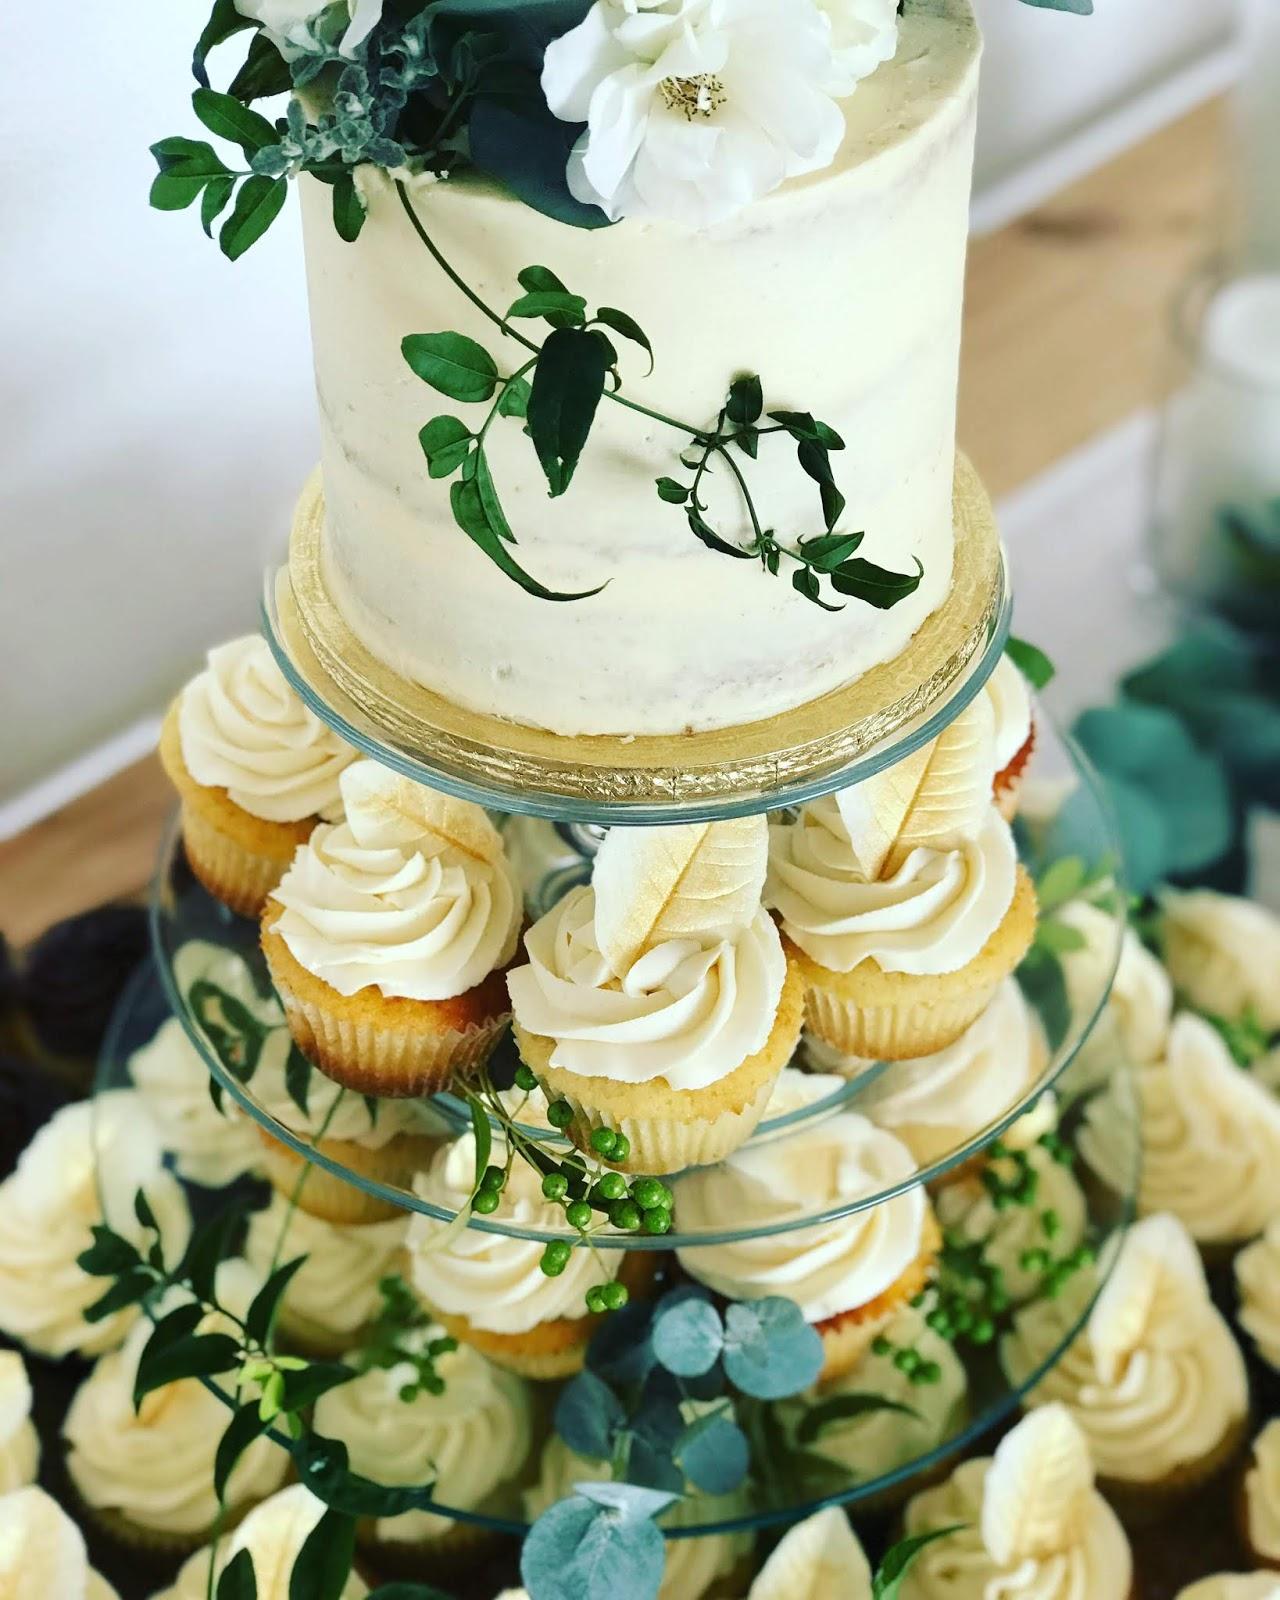 Cupcake Wedding Cakes: Rozanne's Cakes